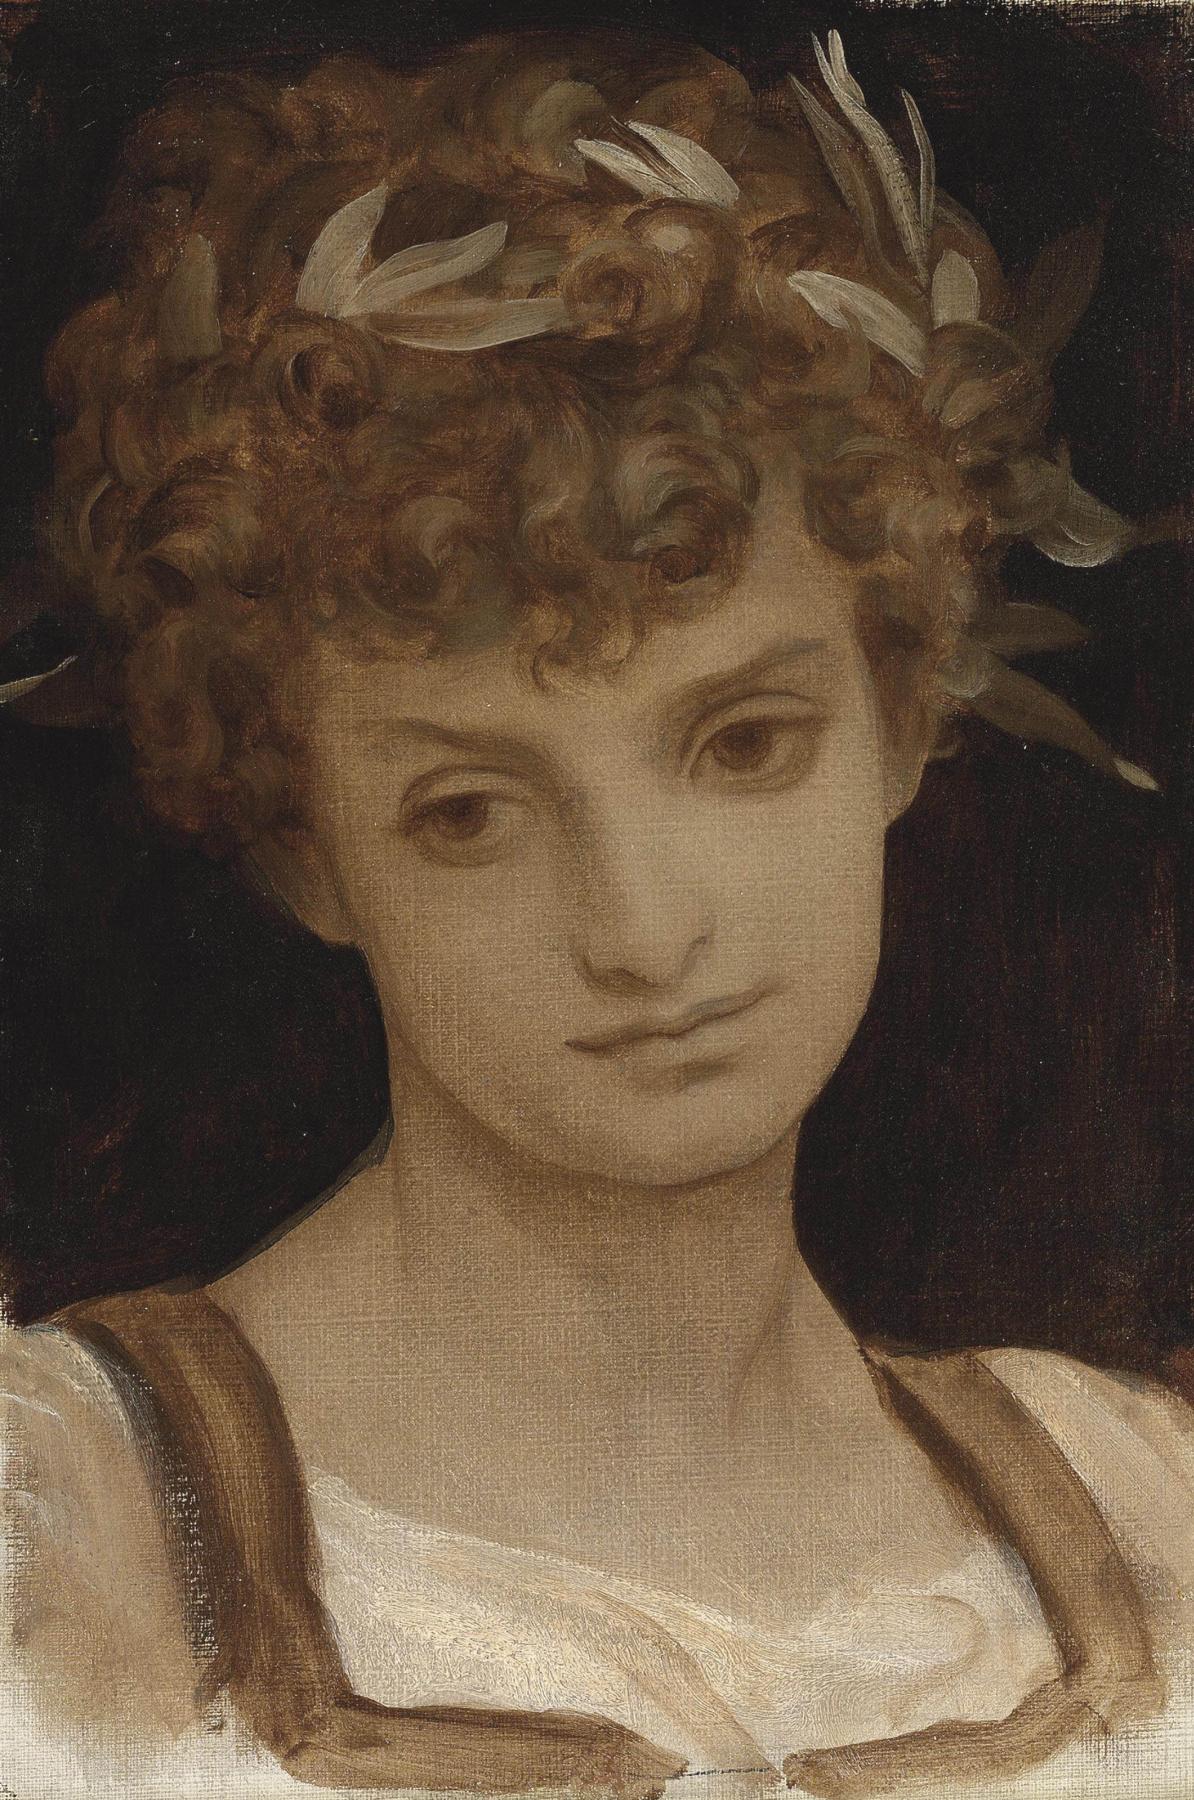 Frederic Leighton. Study of a Girl's Head